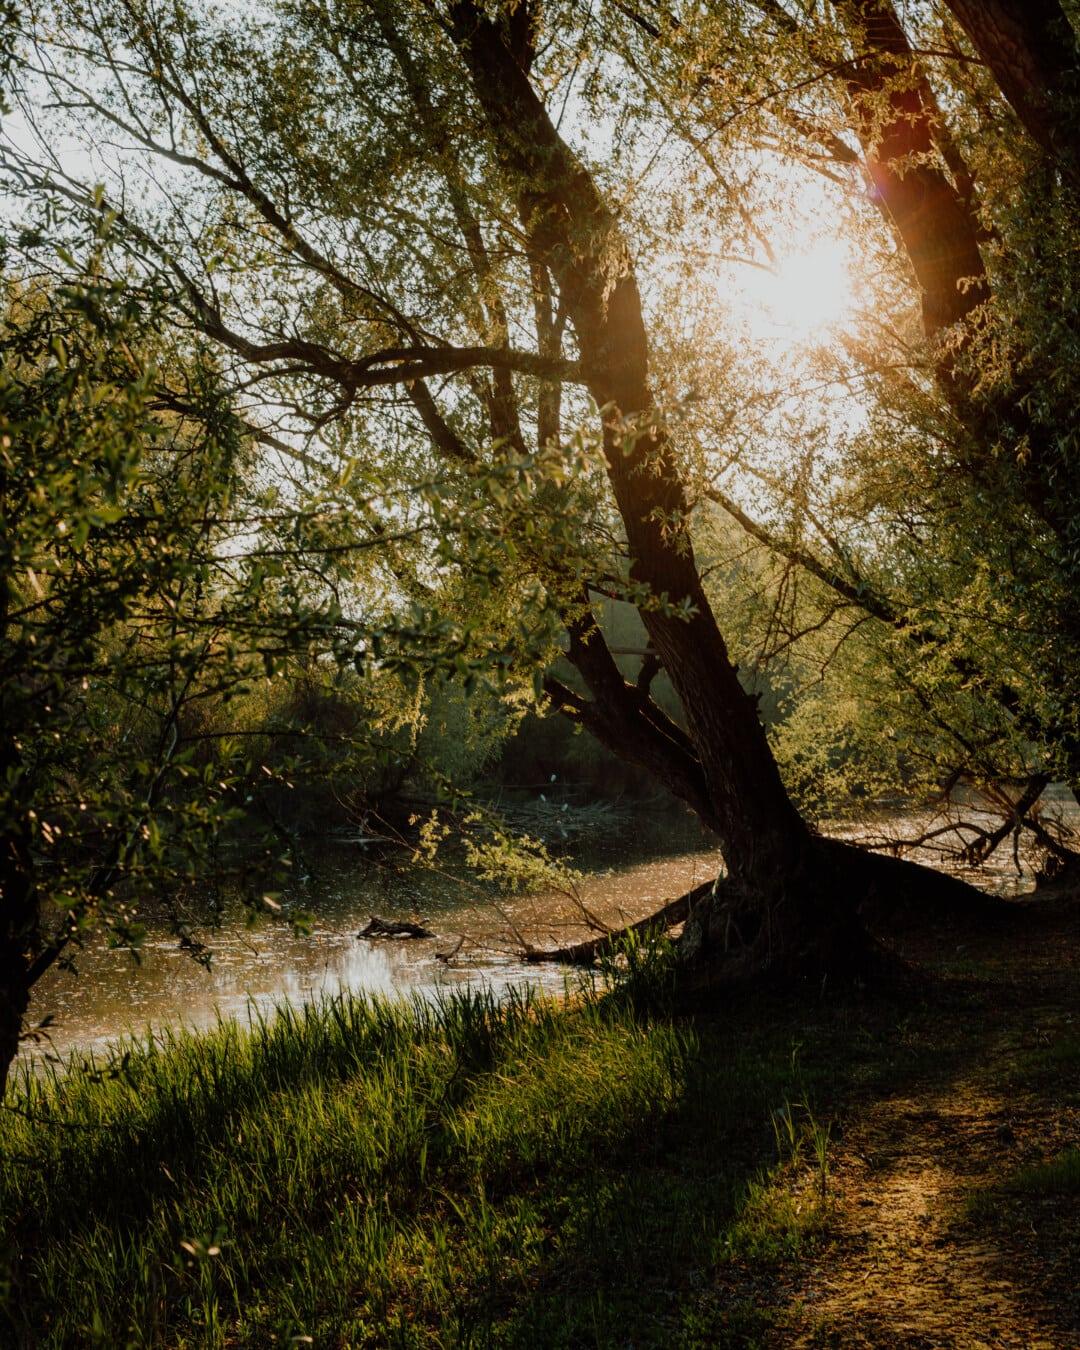 Kanal, Sumpf, Frühling, Sonnenlicht, sonnig, Bäume, hinterleuchtet, Laub, Geäst, Struktur